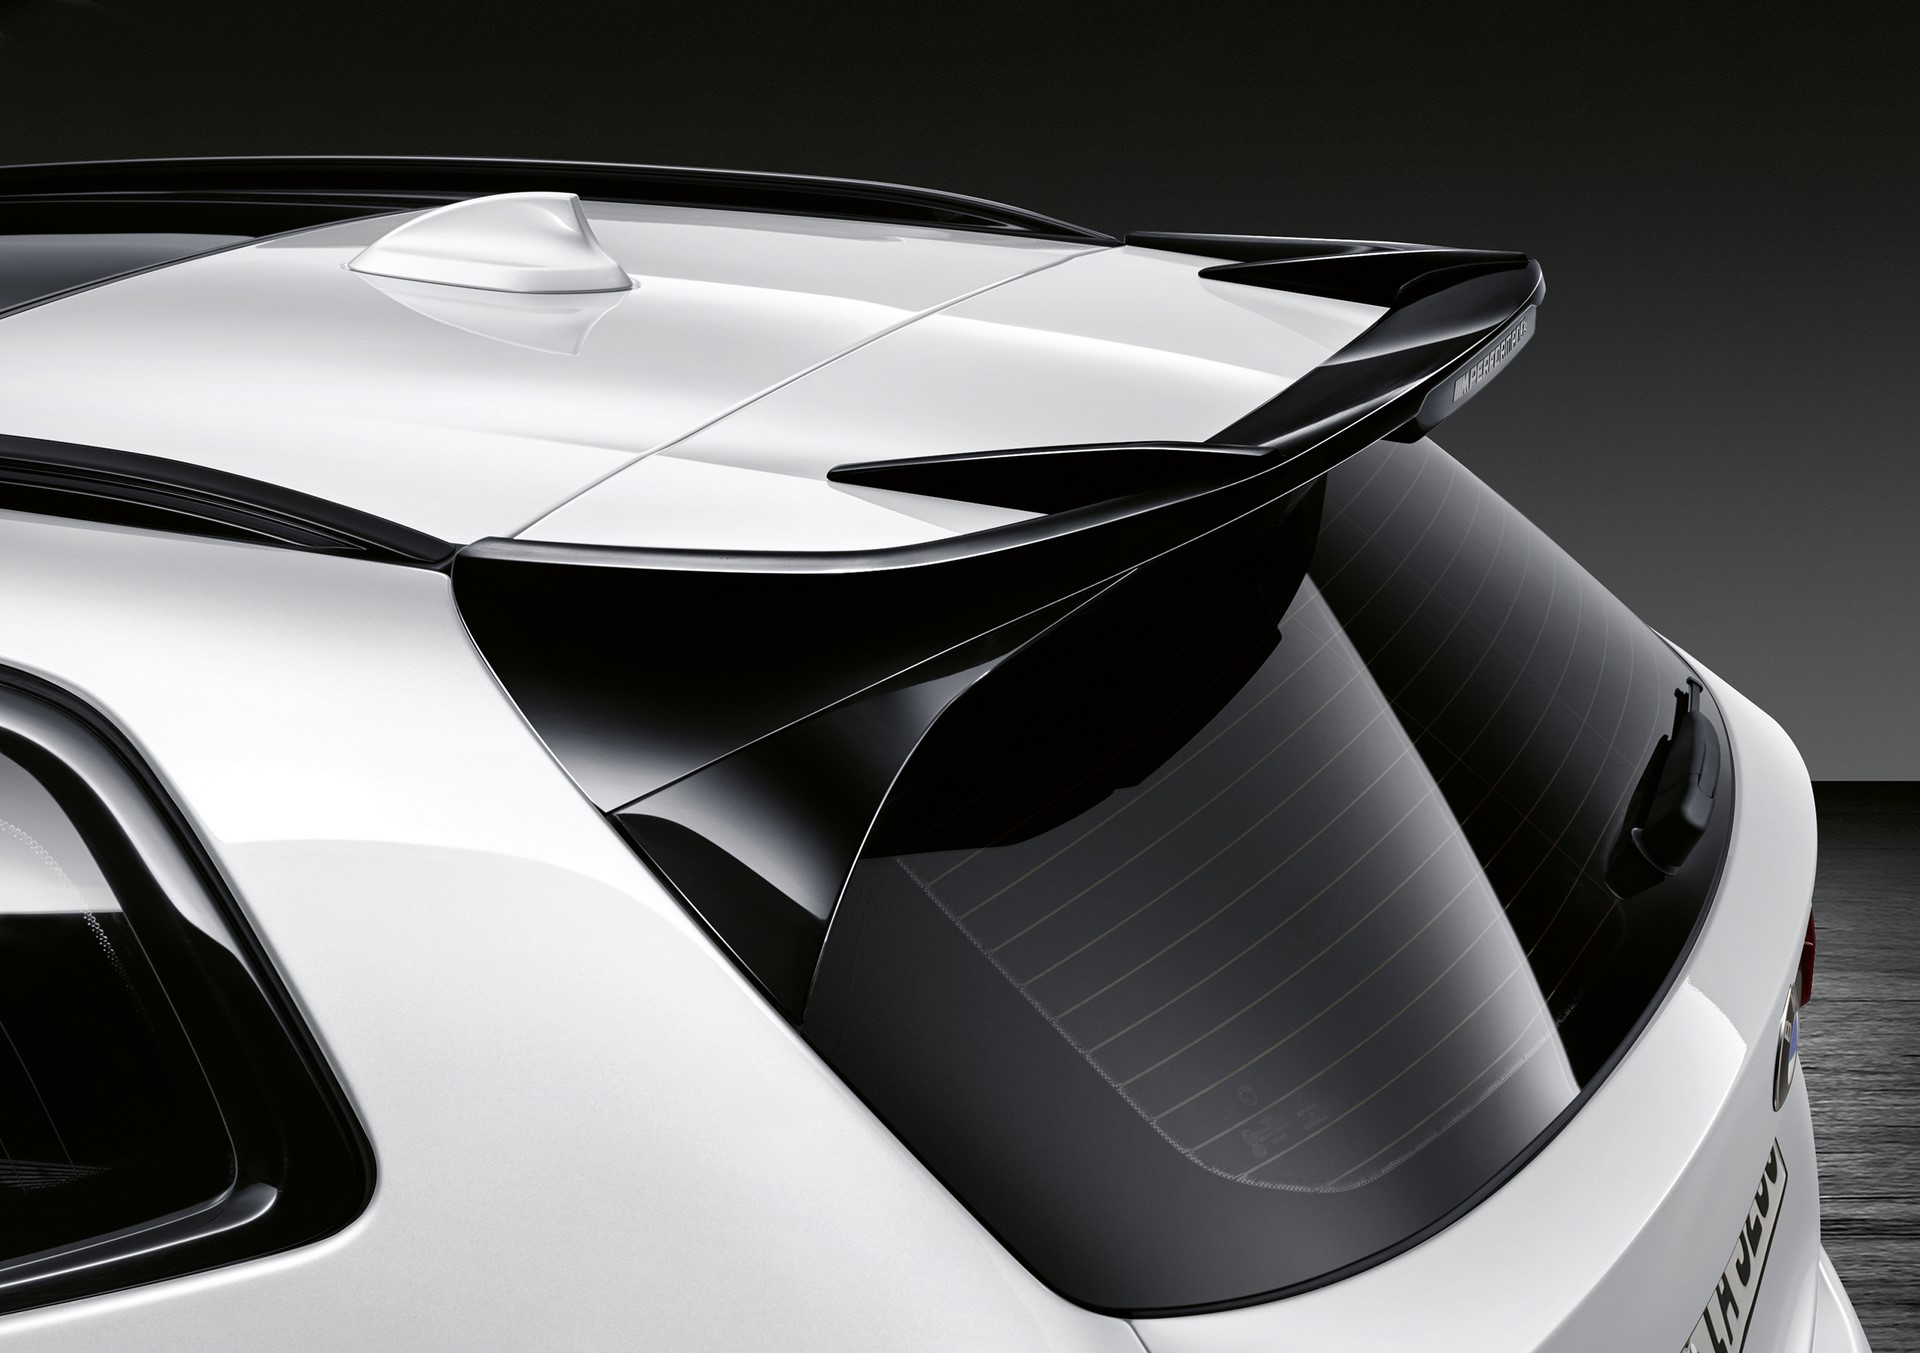 BMW-X3-M-and-BMW-X4-M-M-Performance-Parts-2